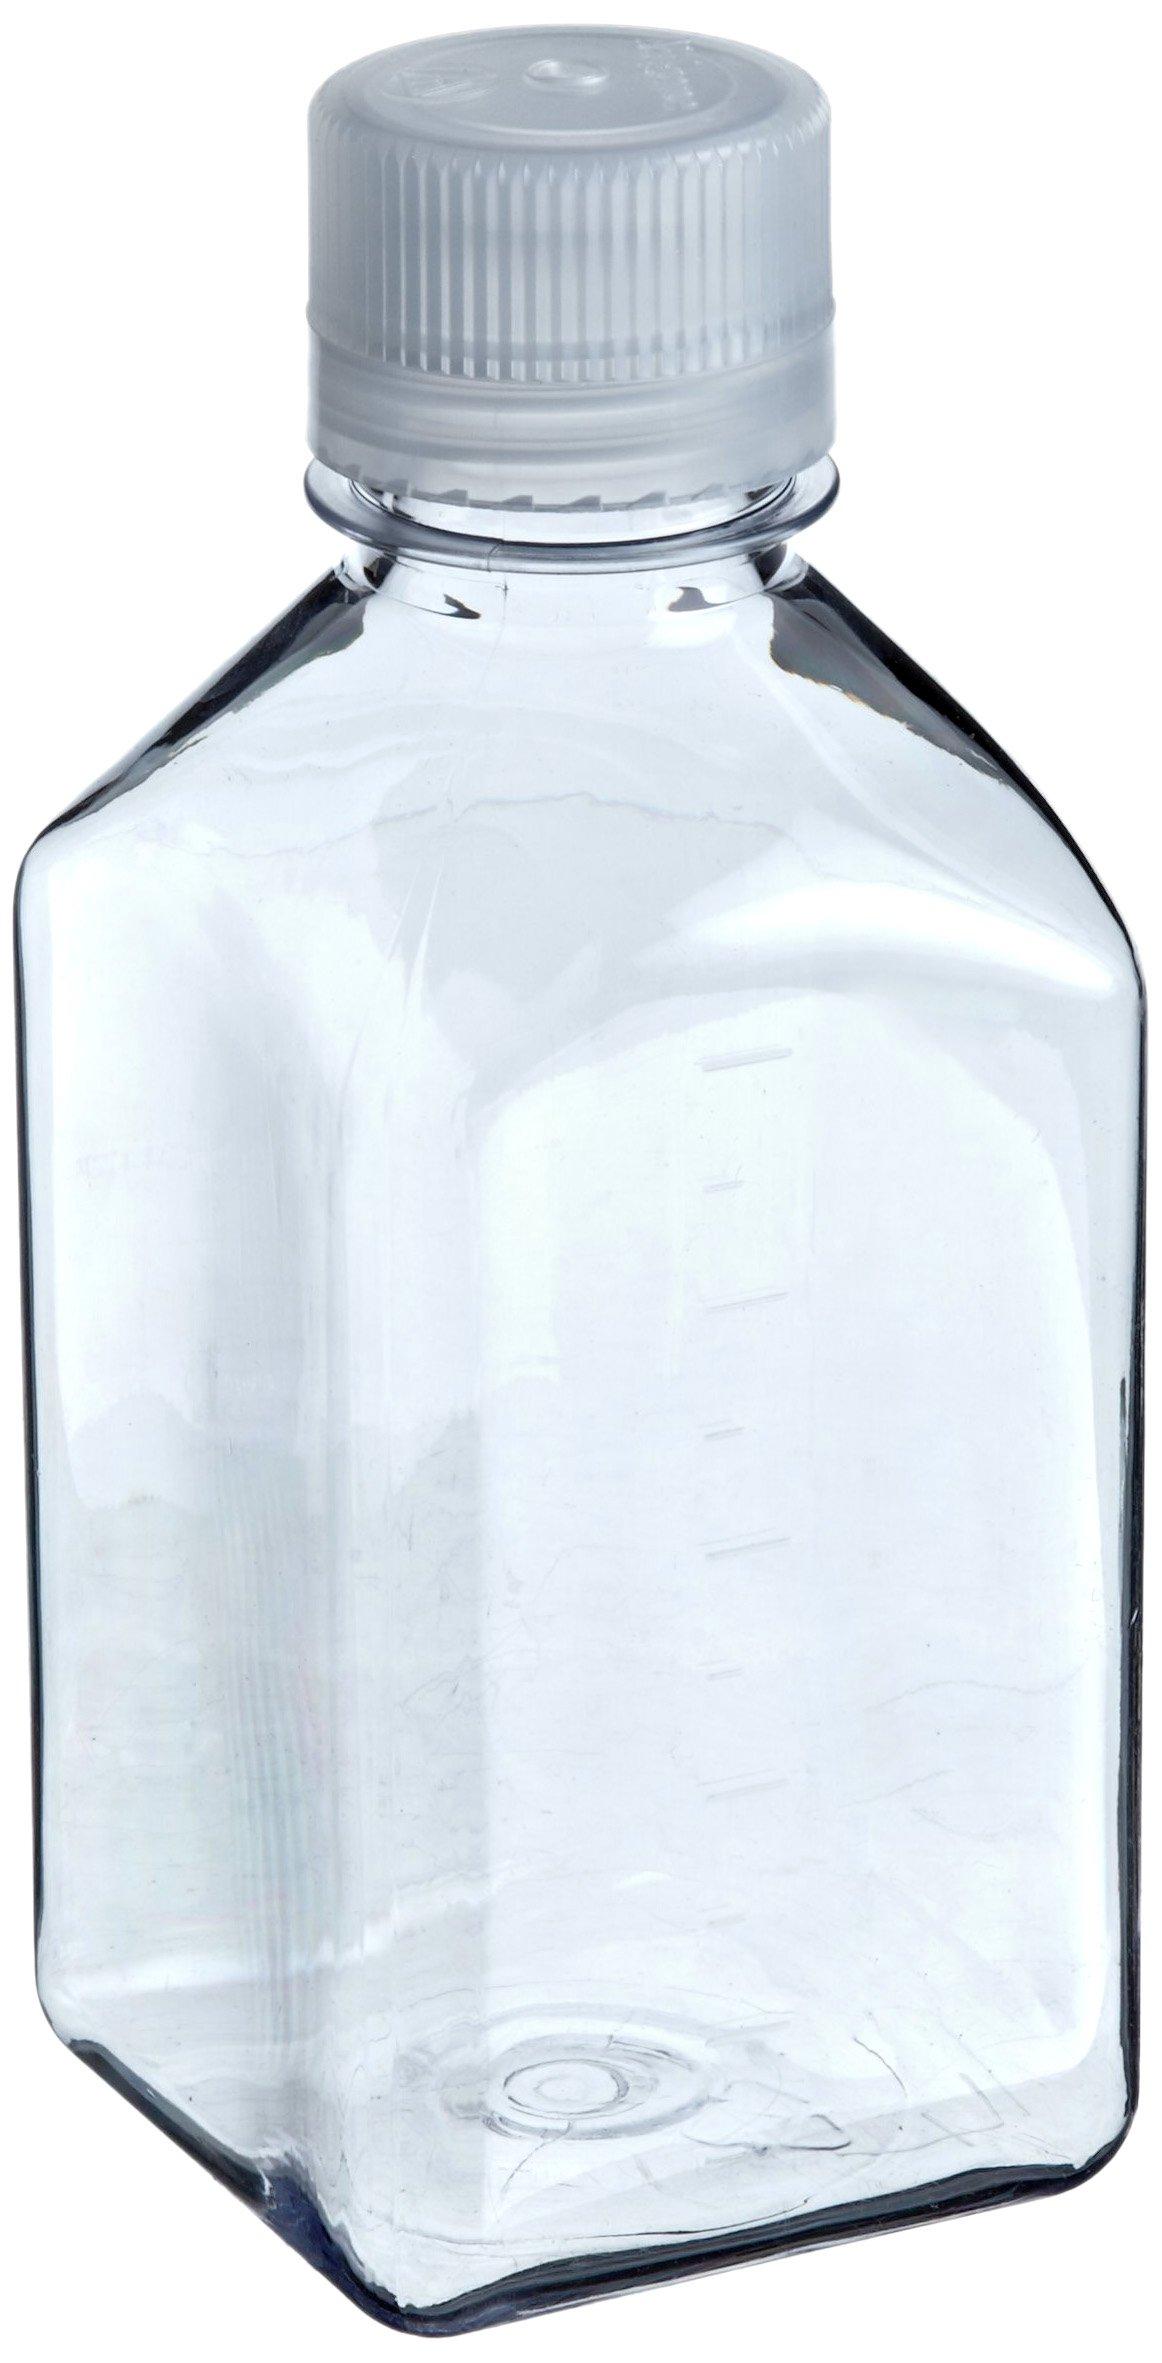 Nalgene 2015-2000 Square Bottle, Polycarbonate, 2000mL